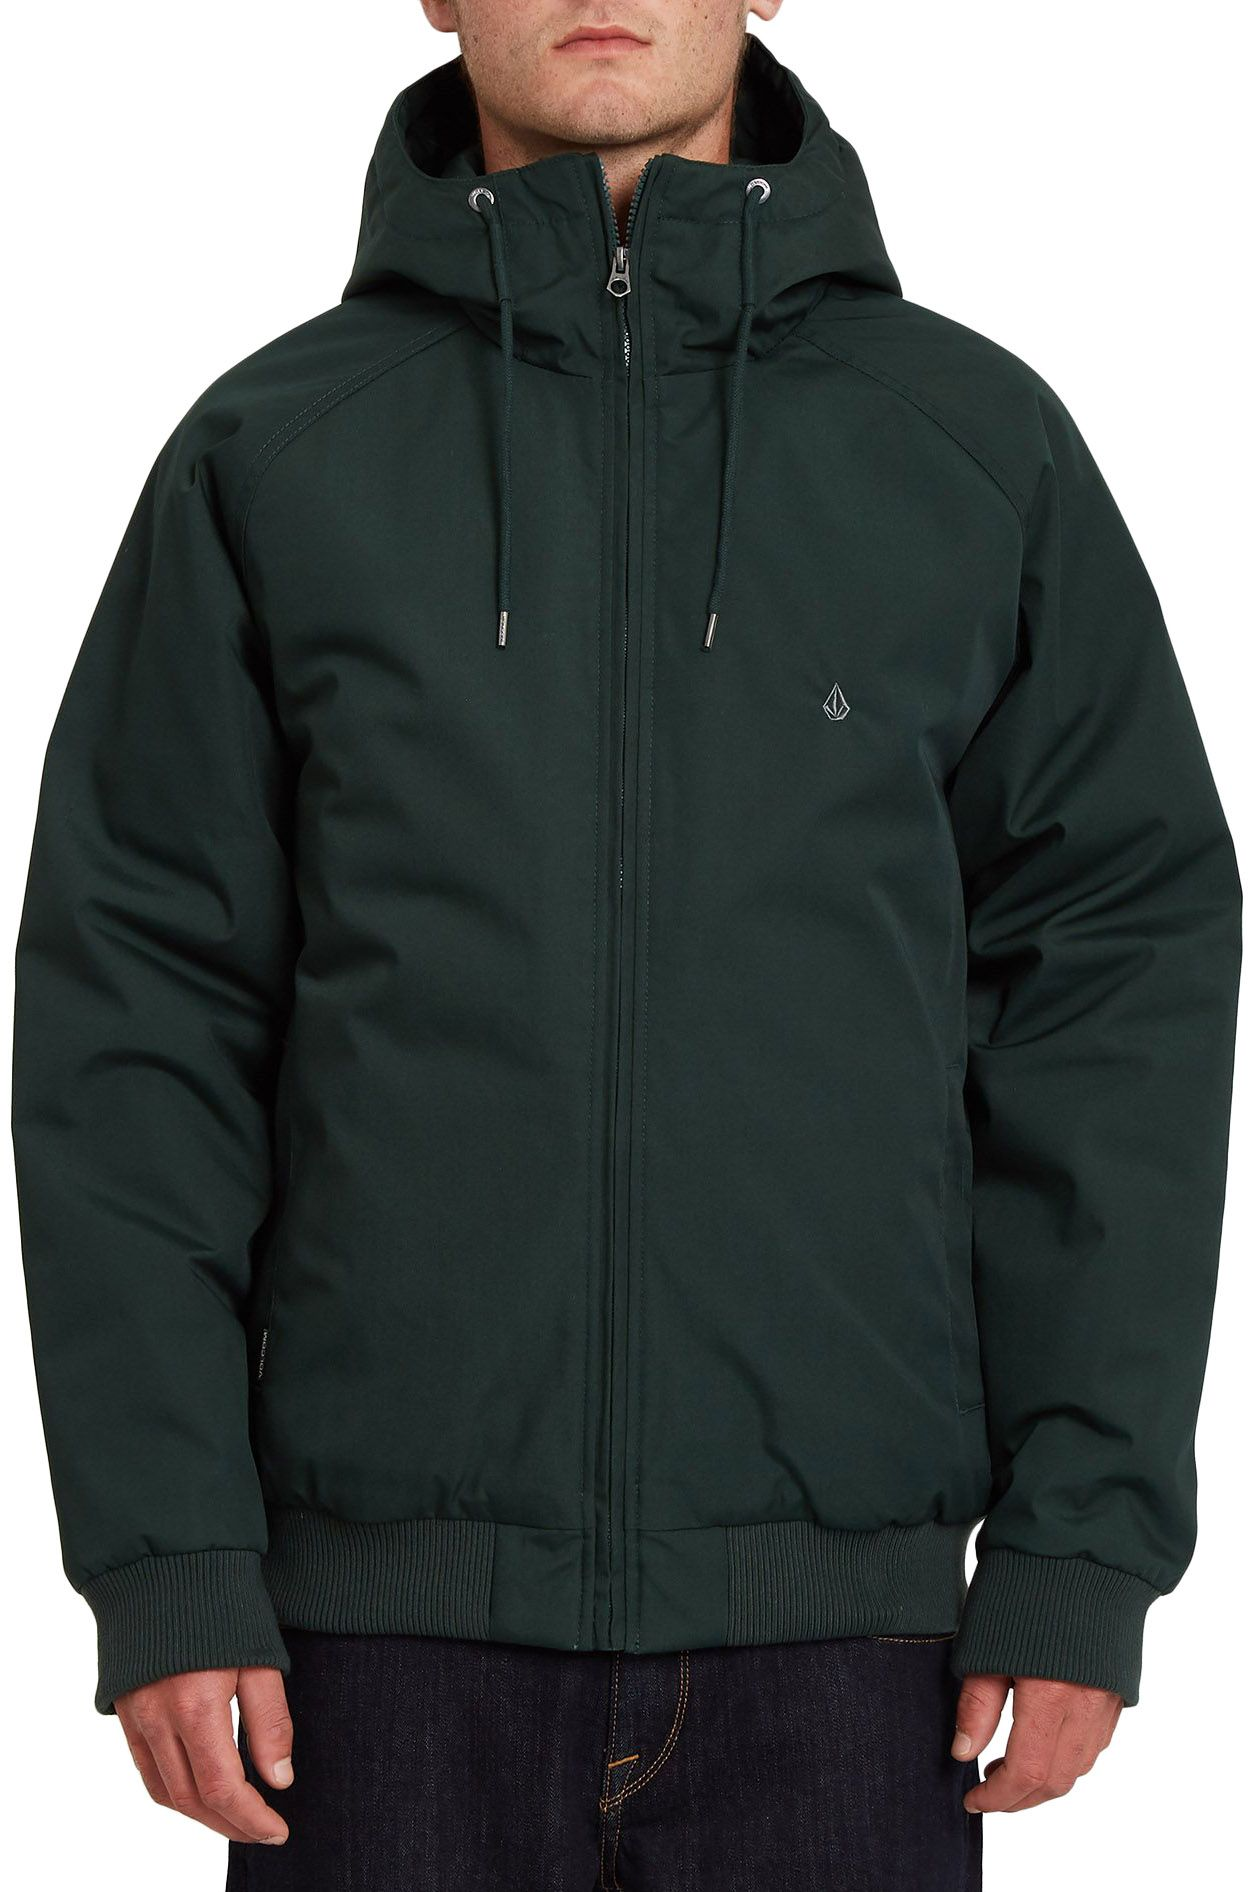 Volcom Jacket HERNAN 5K JACKET Scarab